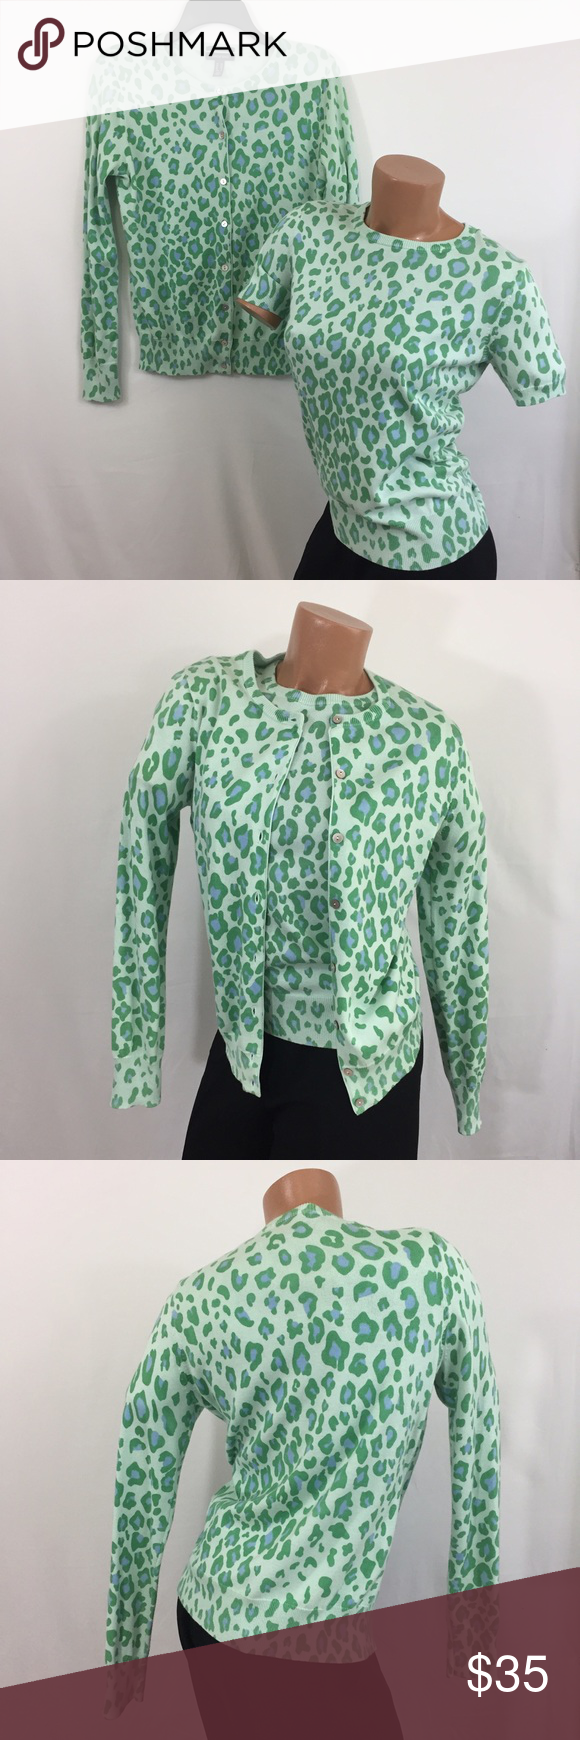 Blue Green Leopard Print Twin Set Cardigan Sweater LANDS' END Twin ...